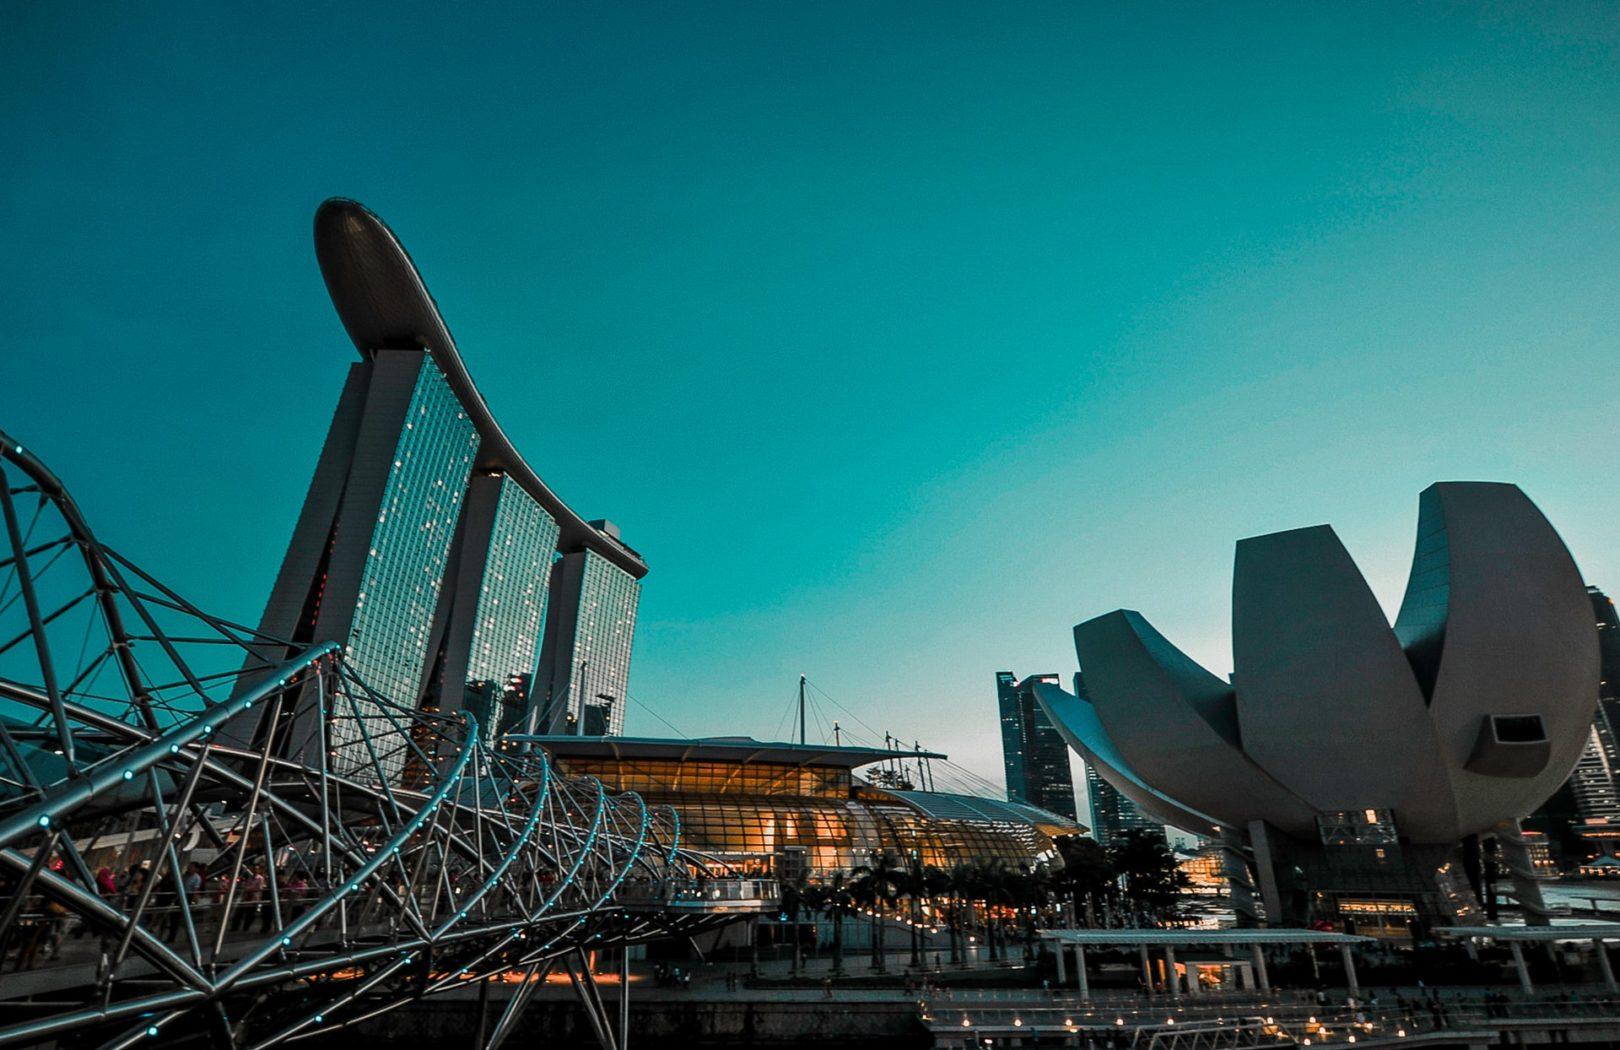 Singapura. Photo by Victor He - Unsplash